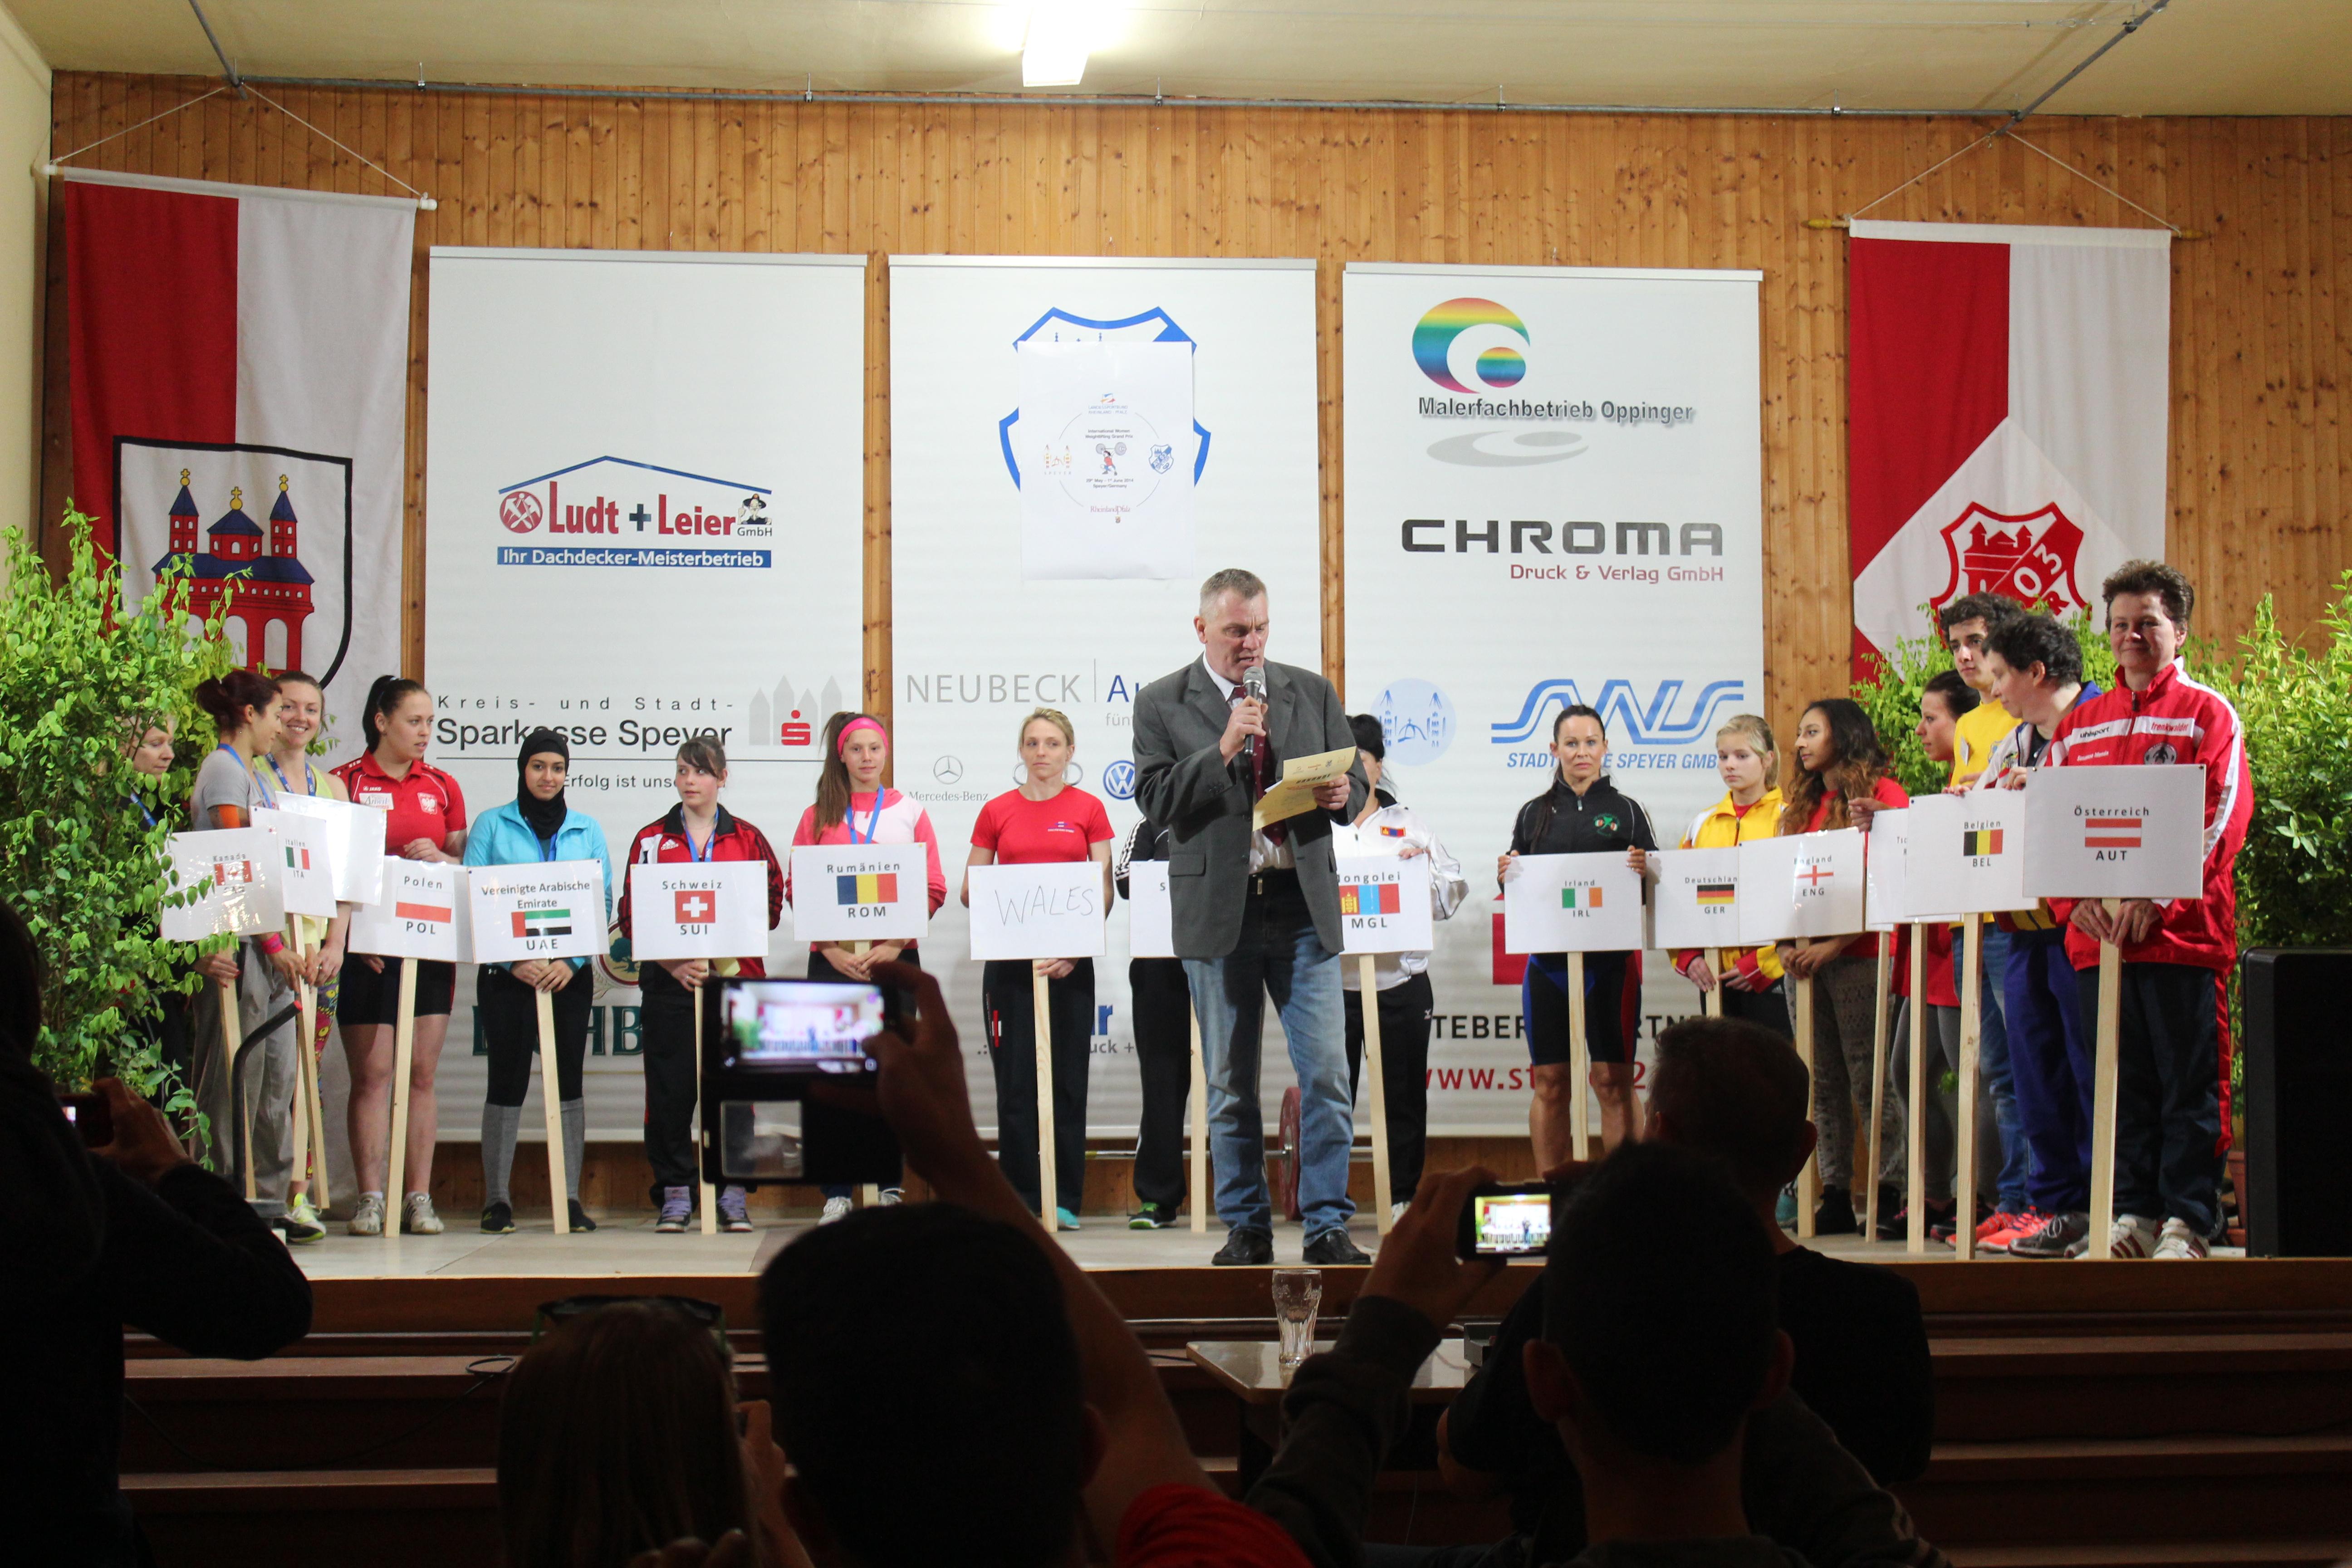 Nation presentation